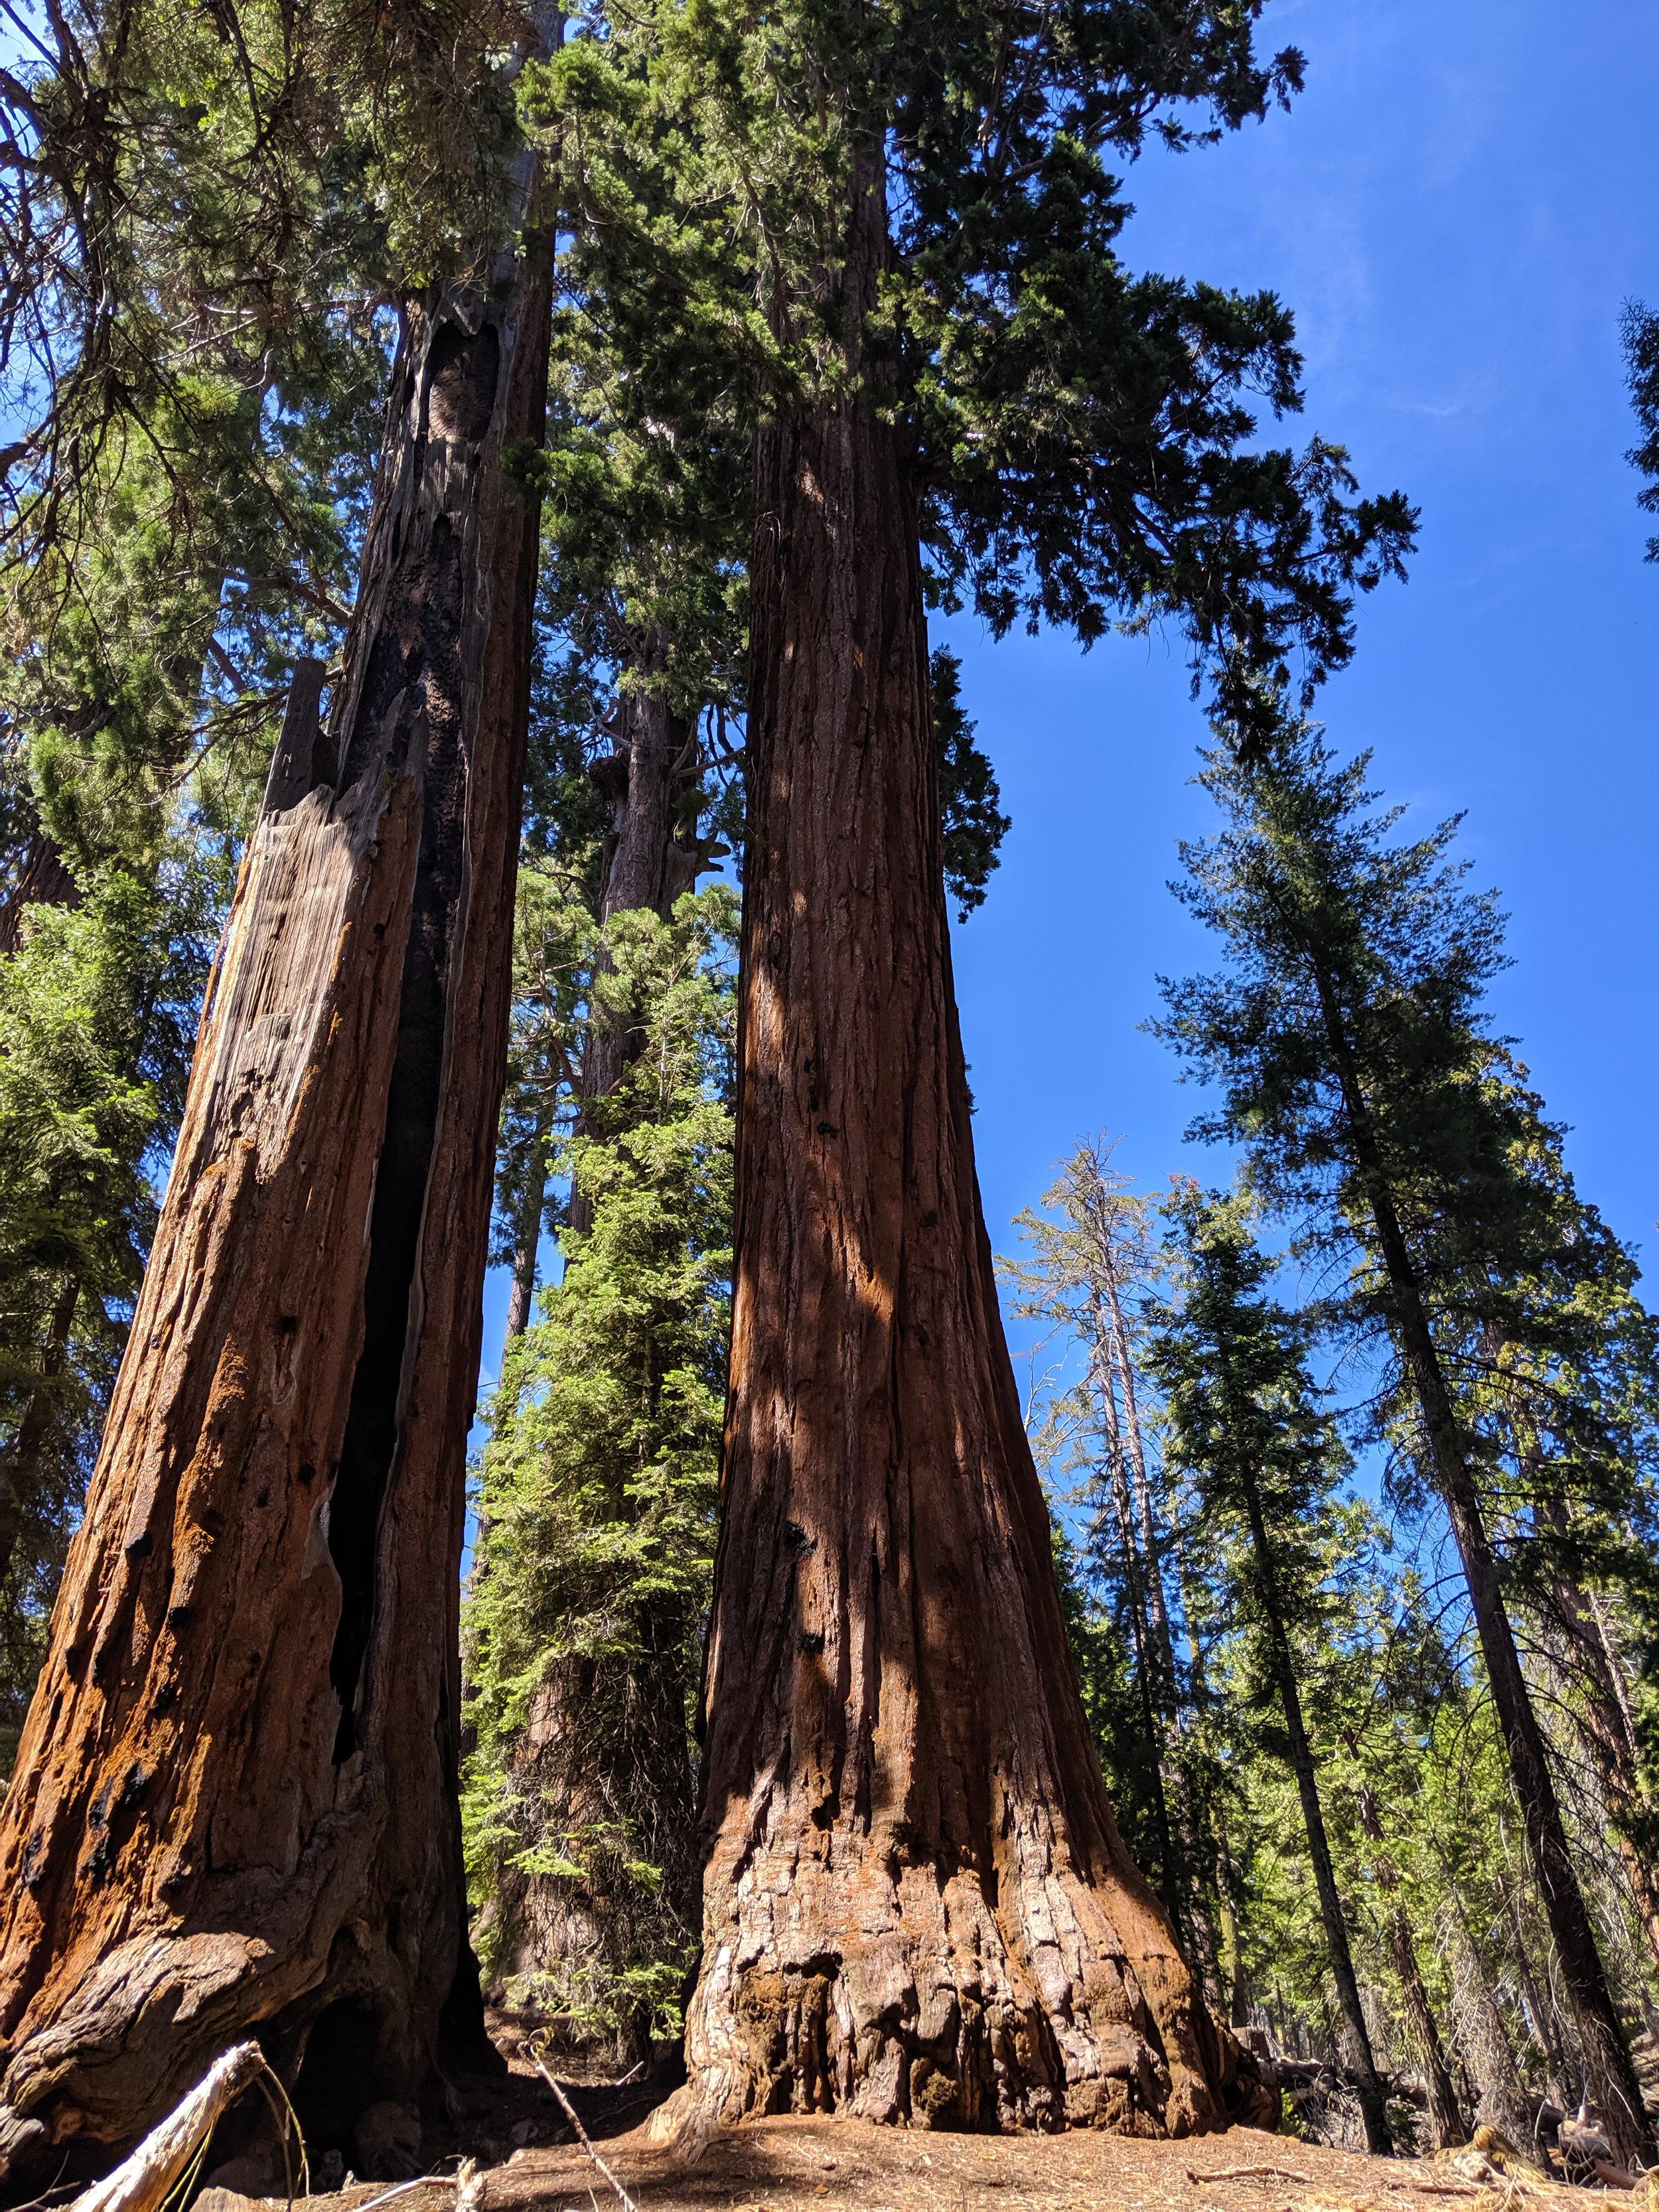 Grants Grove, Kings Canyon, Kings Canyon National Park, CA National Parks